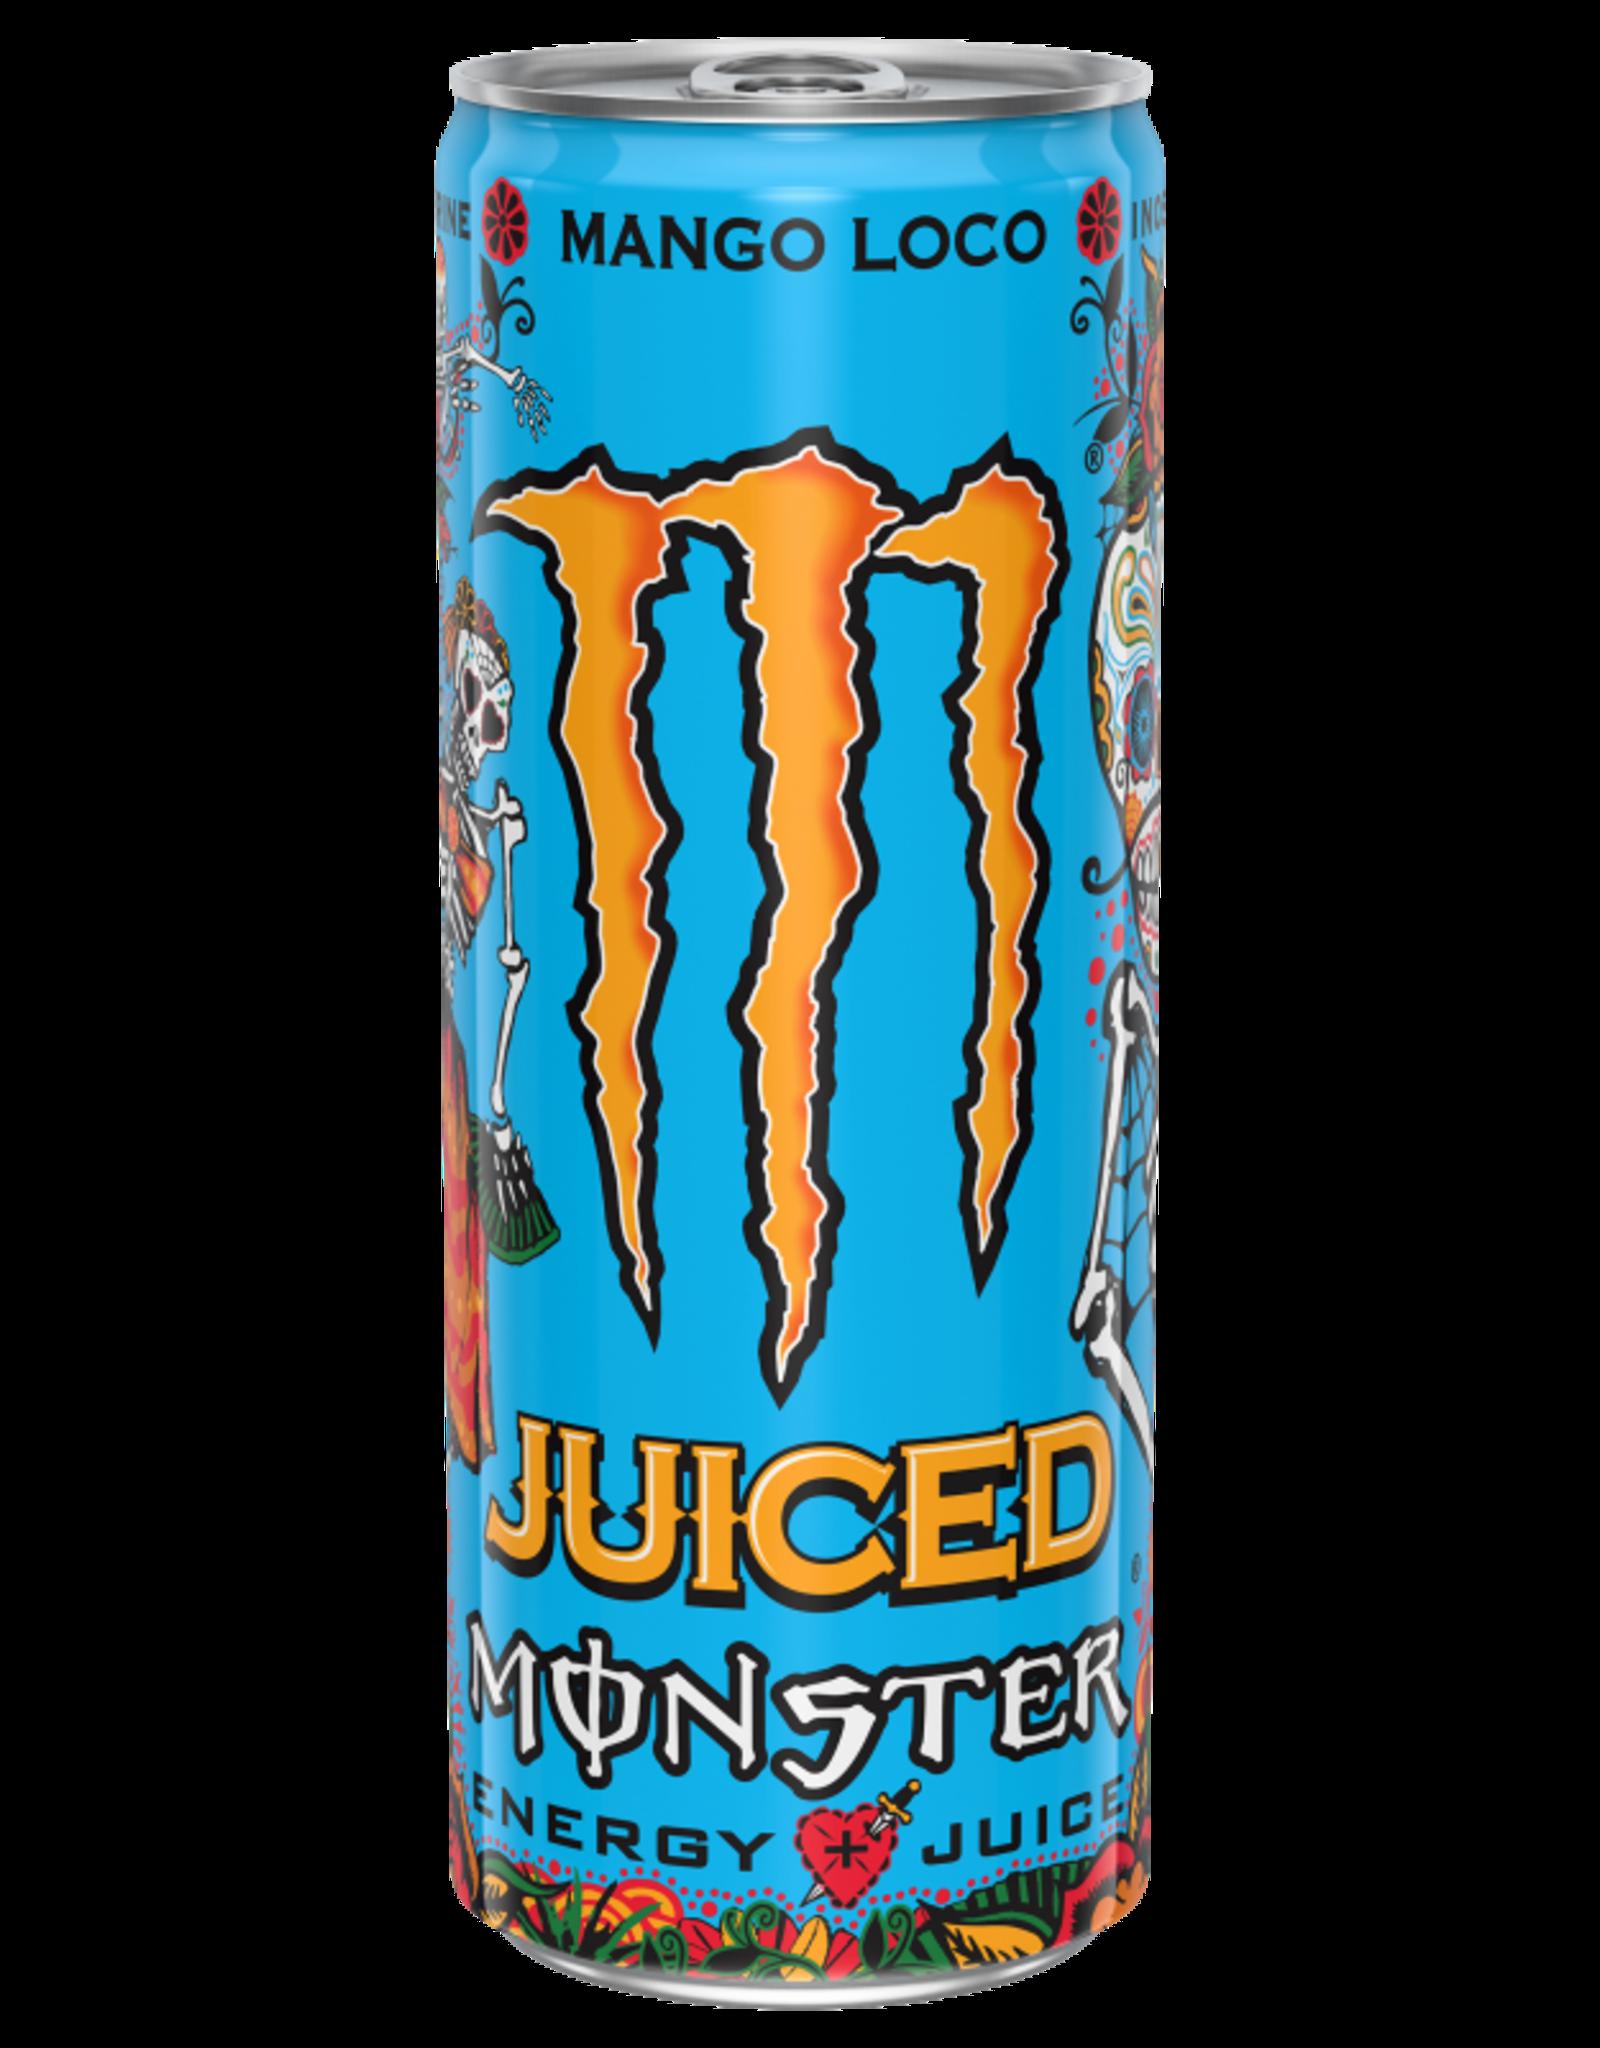 Monster Juiced Mango Loco - 500ml